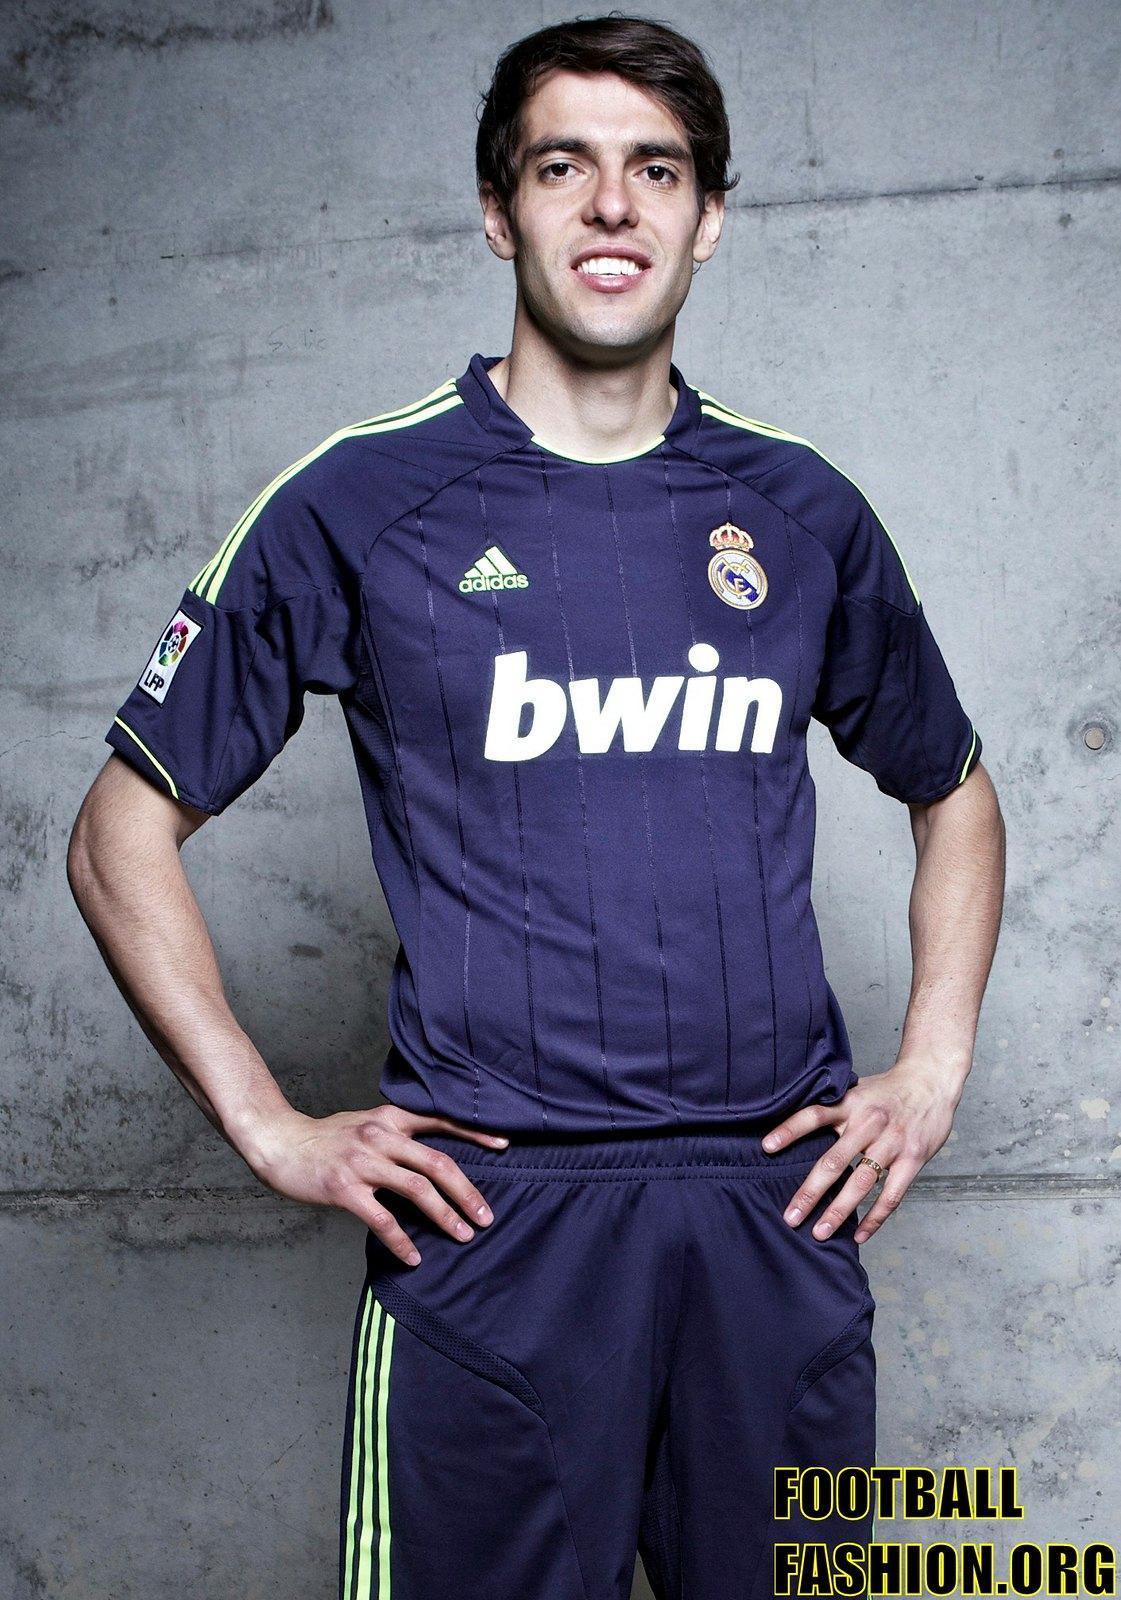 adc13be56 ... Real Madrid adidas 2012 13 Home and Away Soccer Jerseys   Football Kits    Camisetas ...